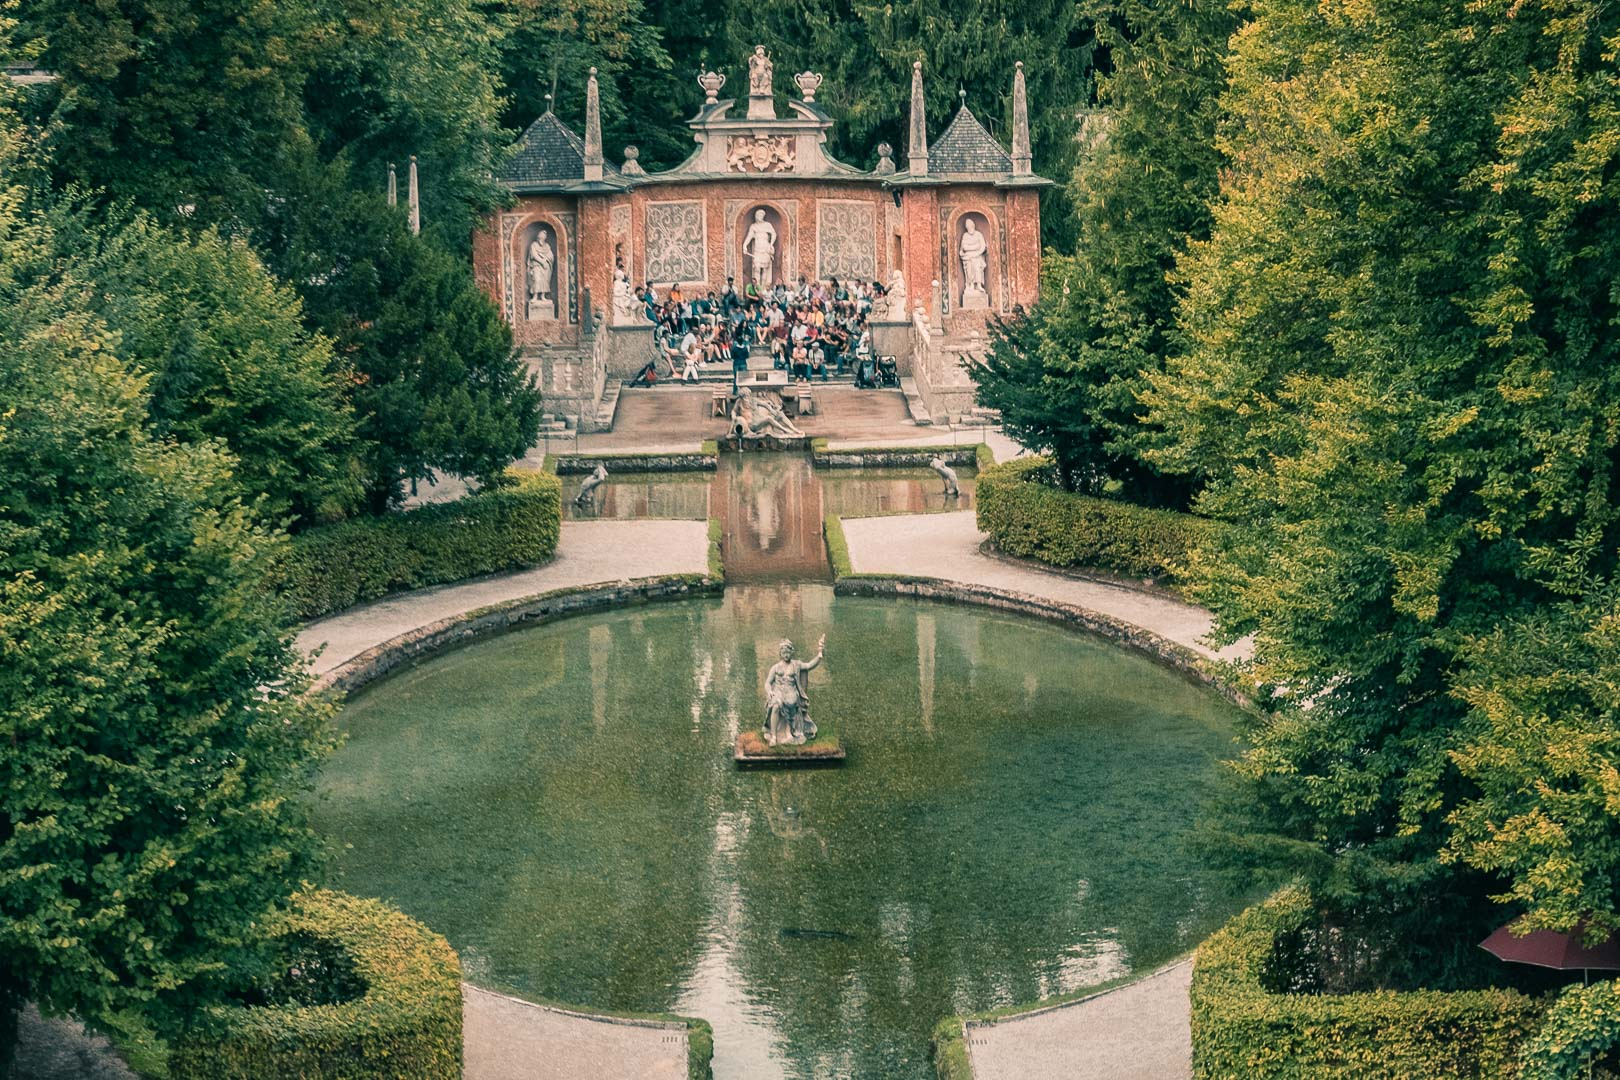 Hellbrunn Trick Fountain Tour